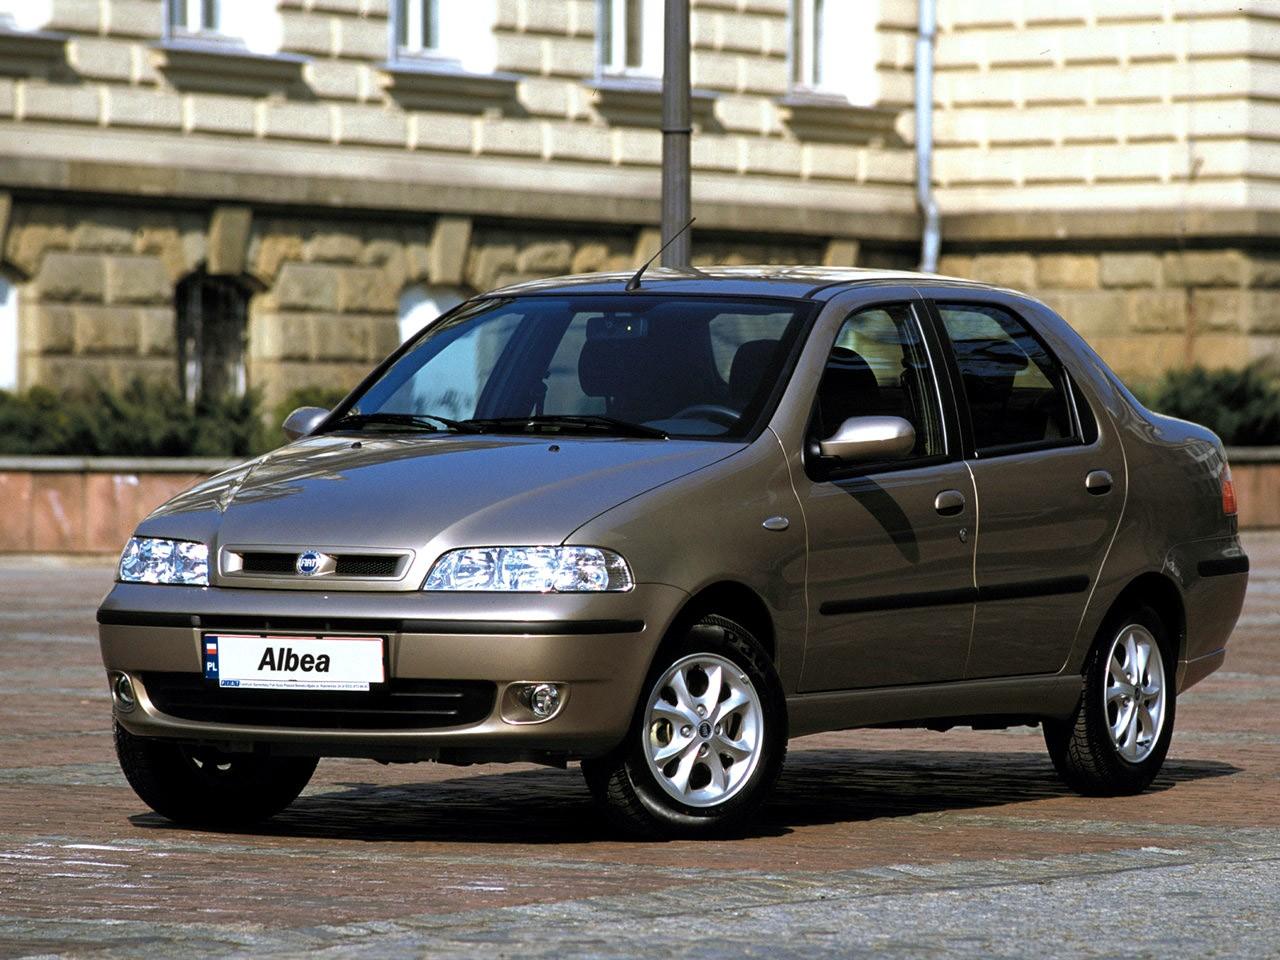 Fiat Albea I 2002 - 2005 Sedan #8